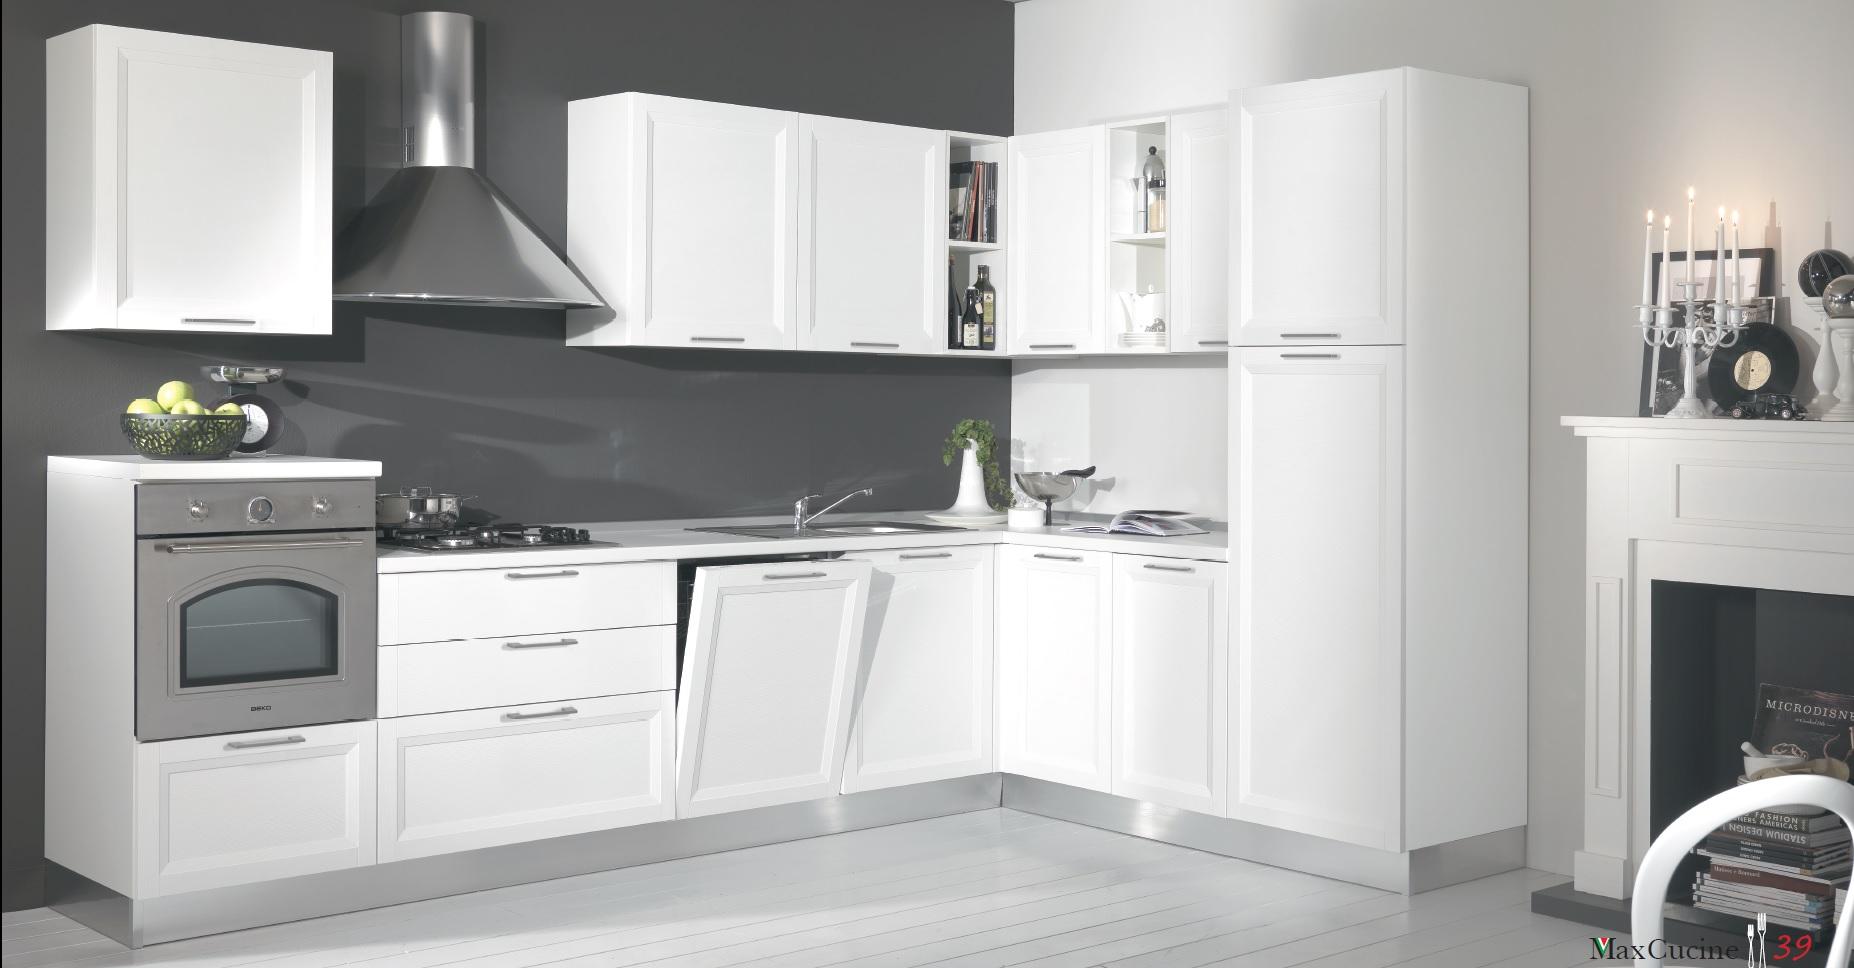 Cucine senza elettrodomestici cucina elettrodomestici senza social shopping su - Cucina senza elettrodomestici ...